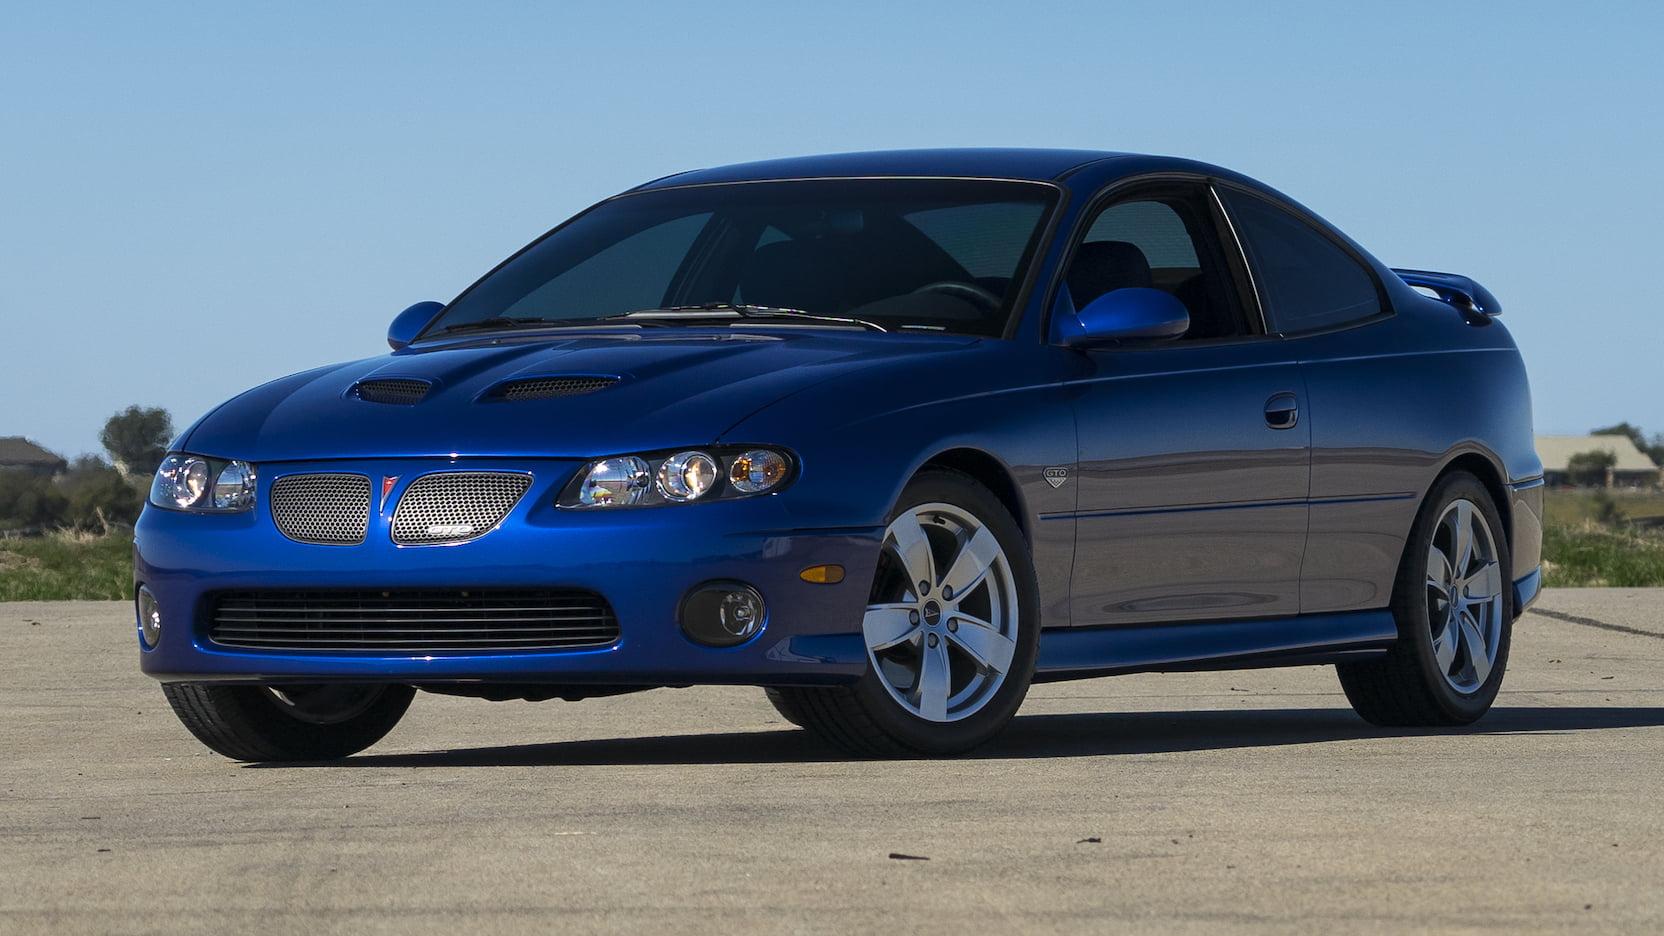 2005 Pontiac GTO 3/4 front